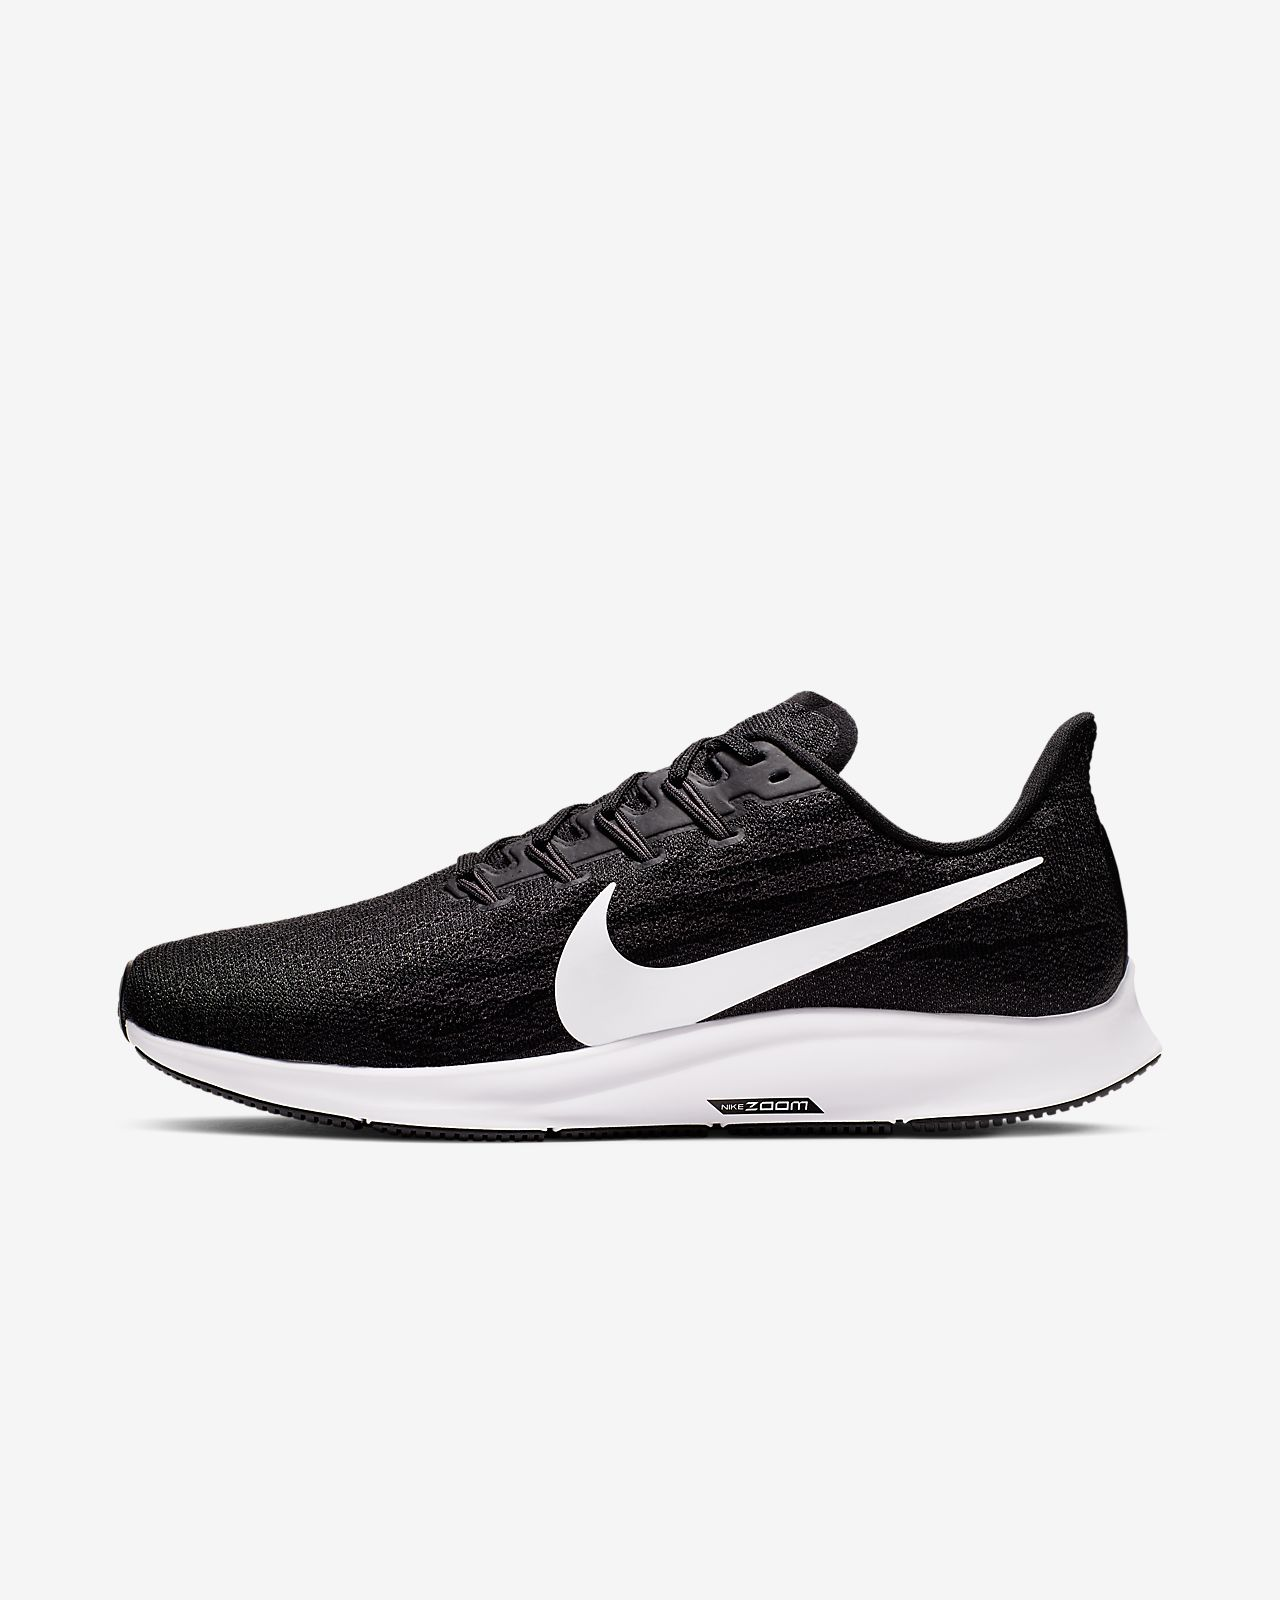 Nike Air Zoom Pegasus 36 Herren-Laufschuh (weit)